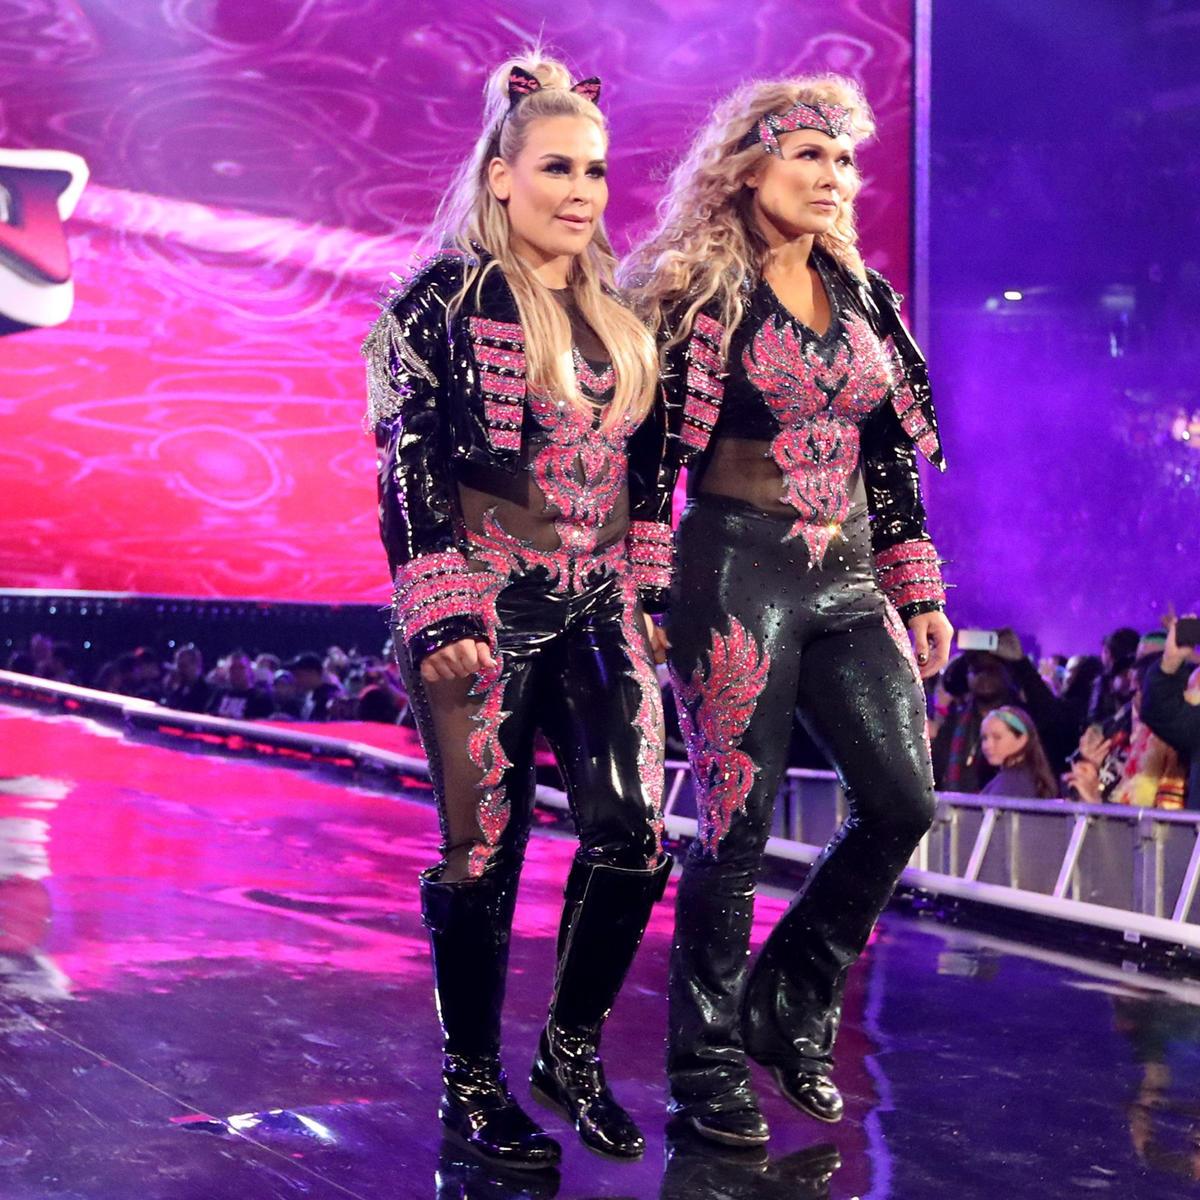 Image result for Natalya and Beth Phoenix Wrestlemania 35